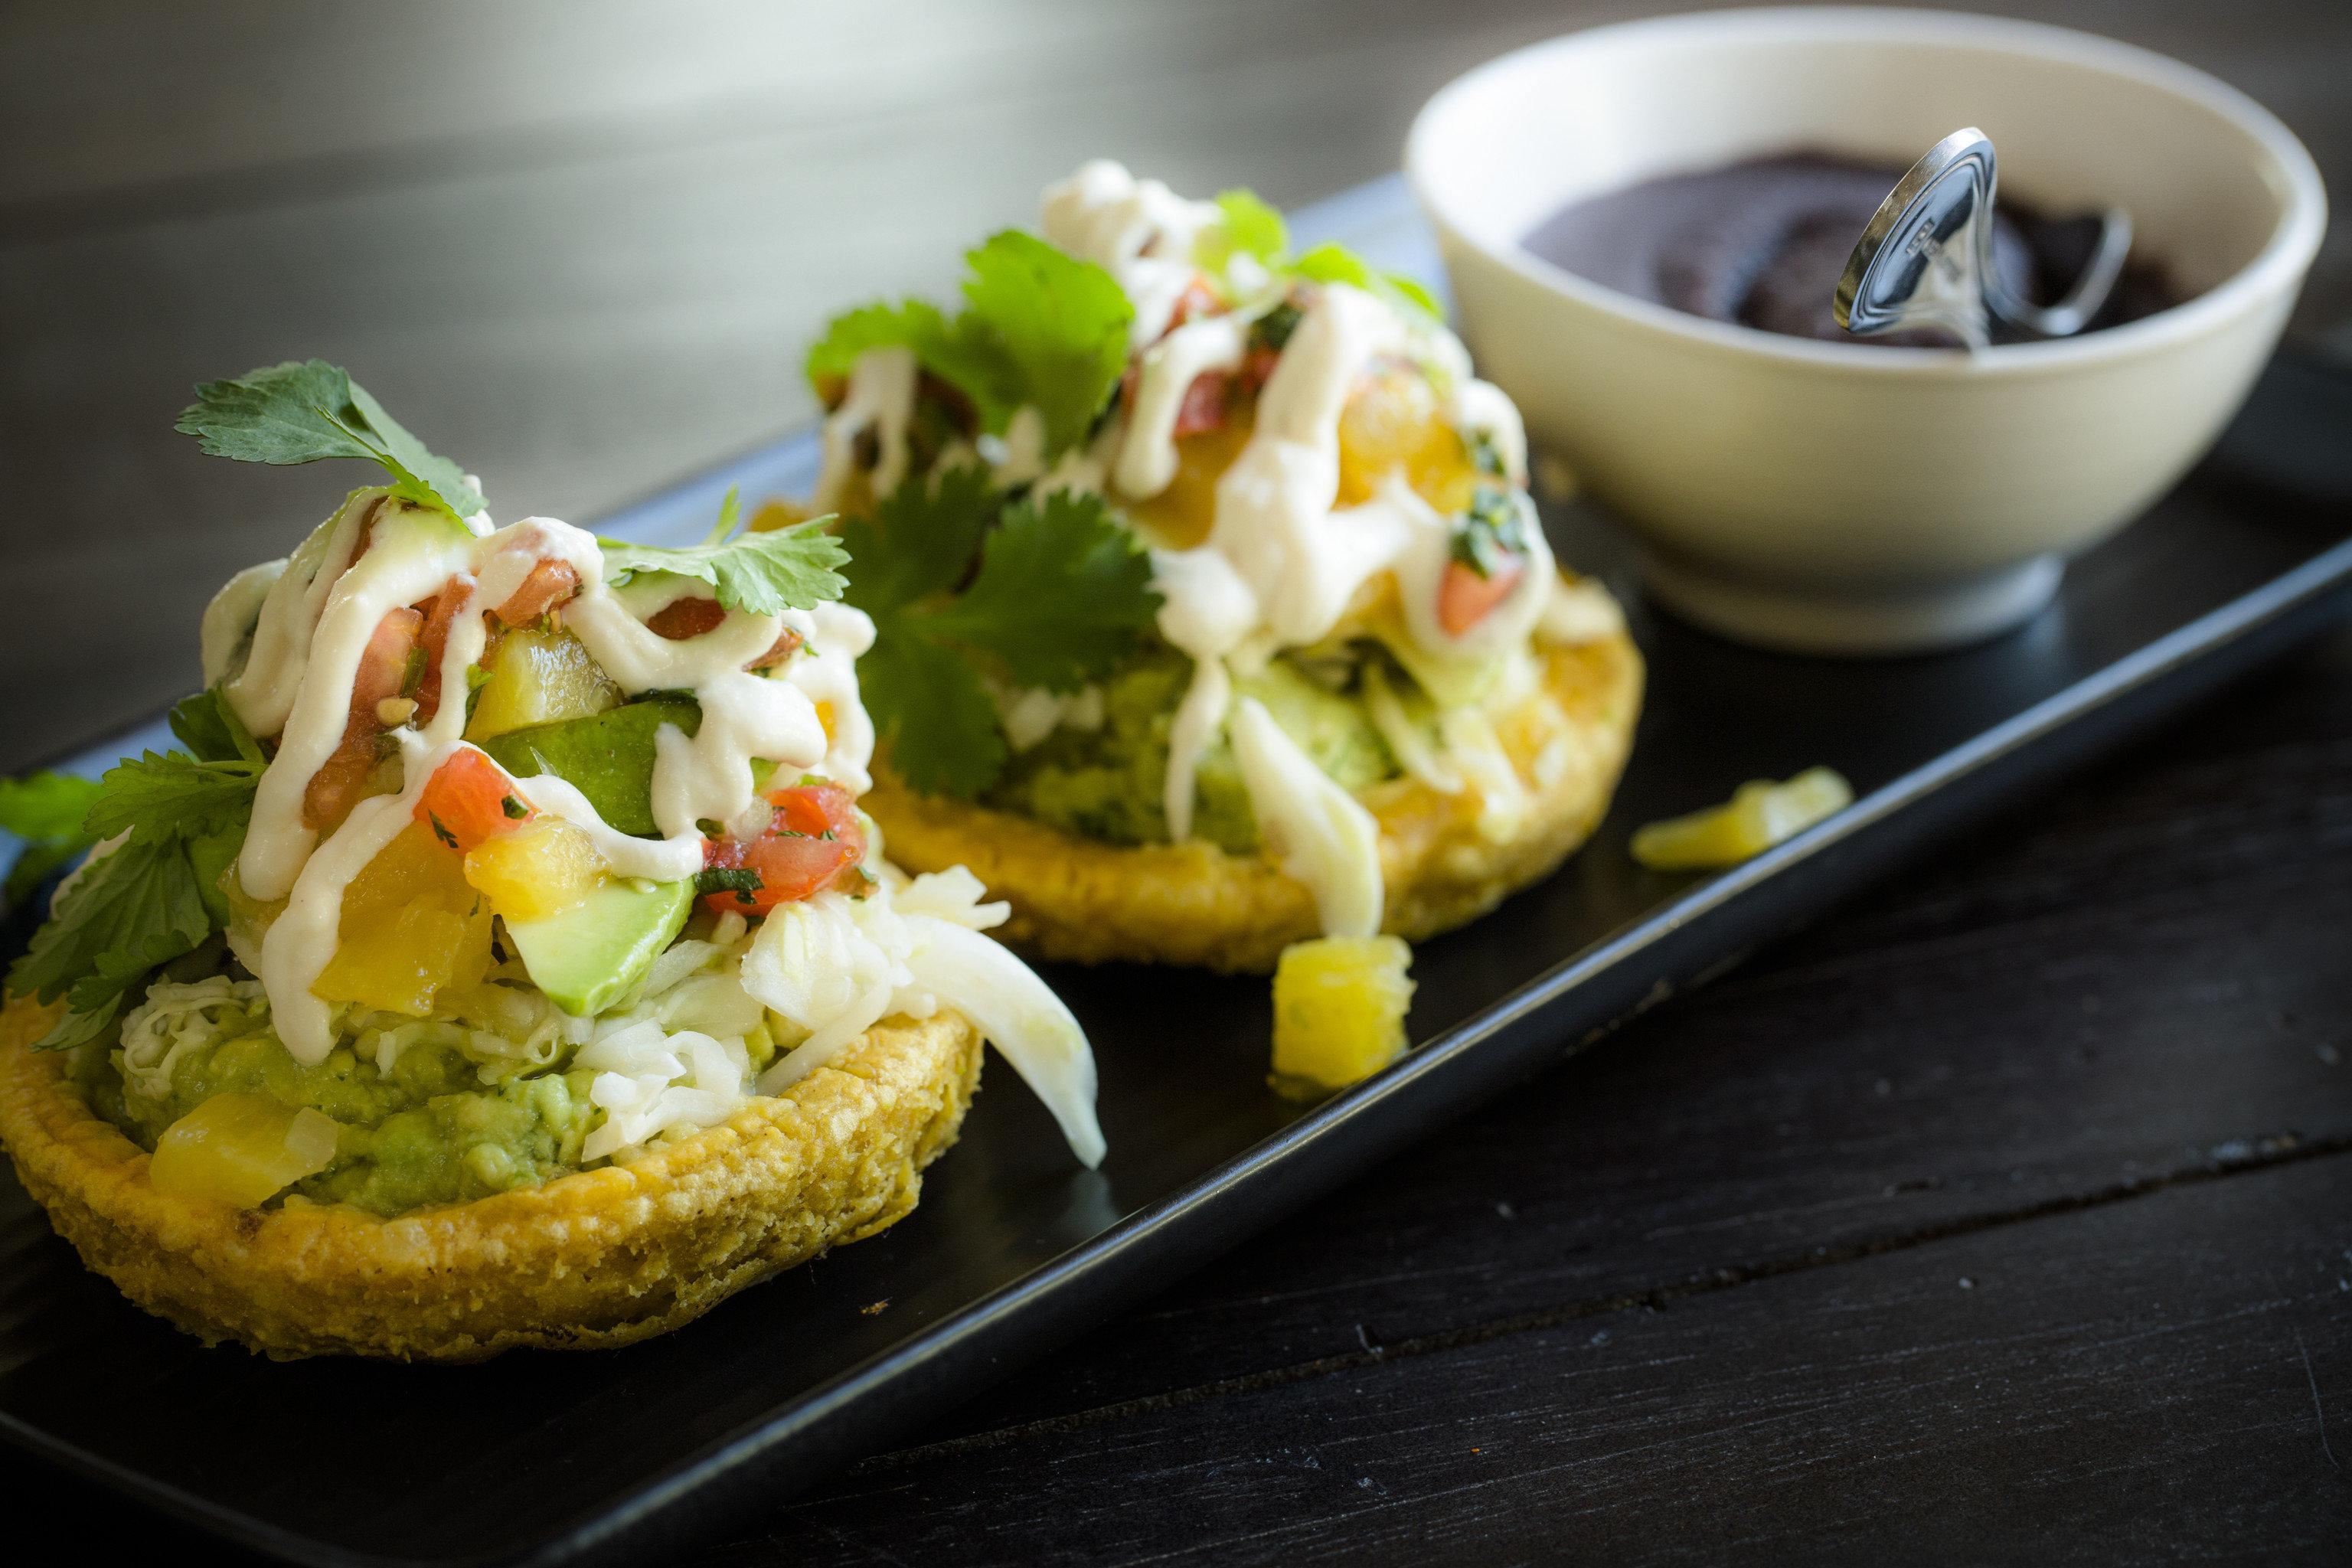 Travel Tips food dish meal breakfast cuisine produce vegetarian food salad